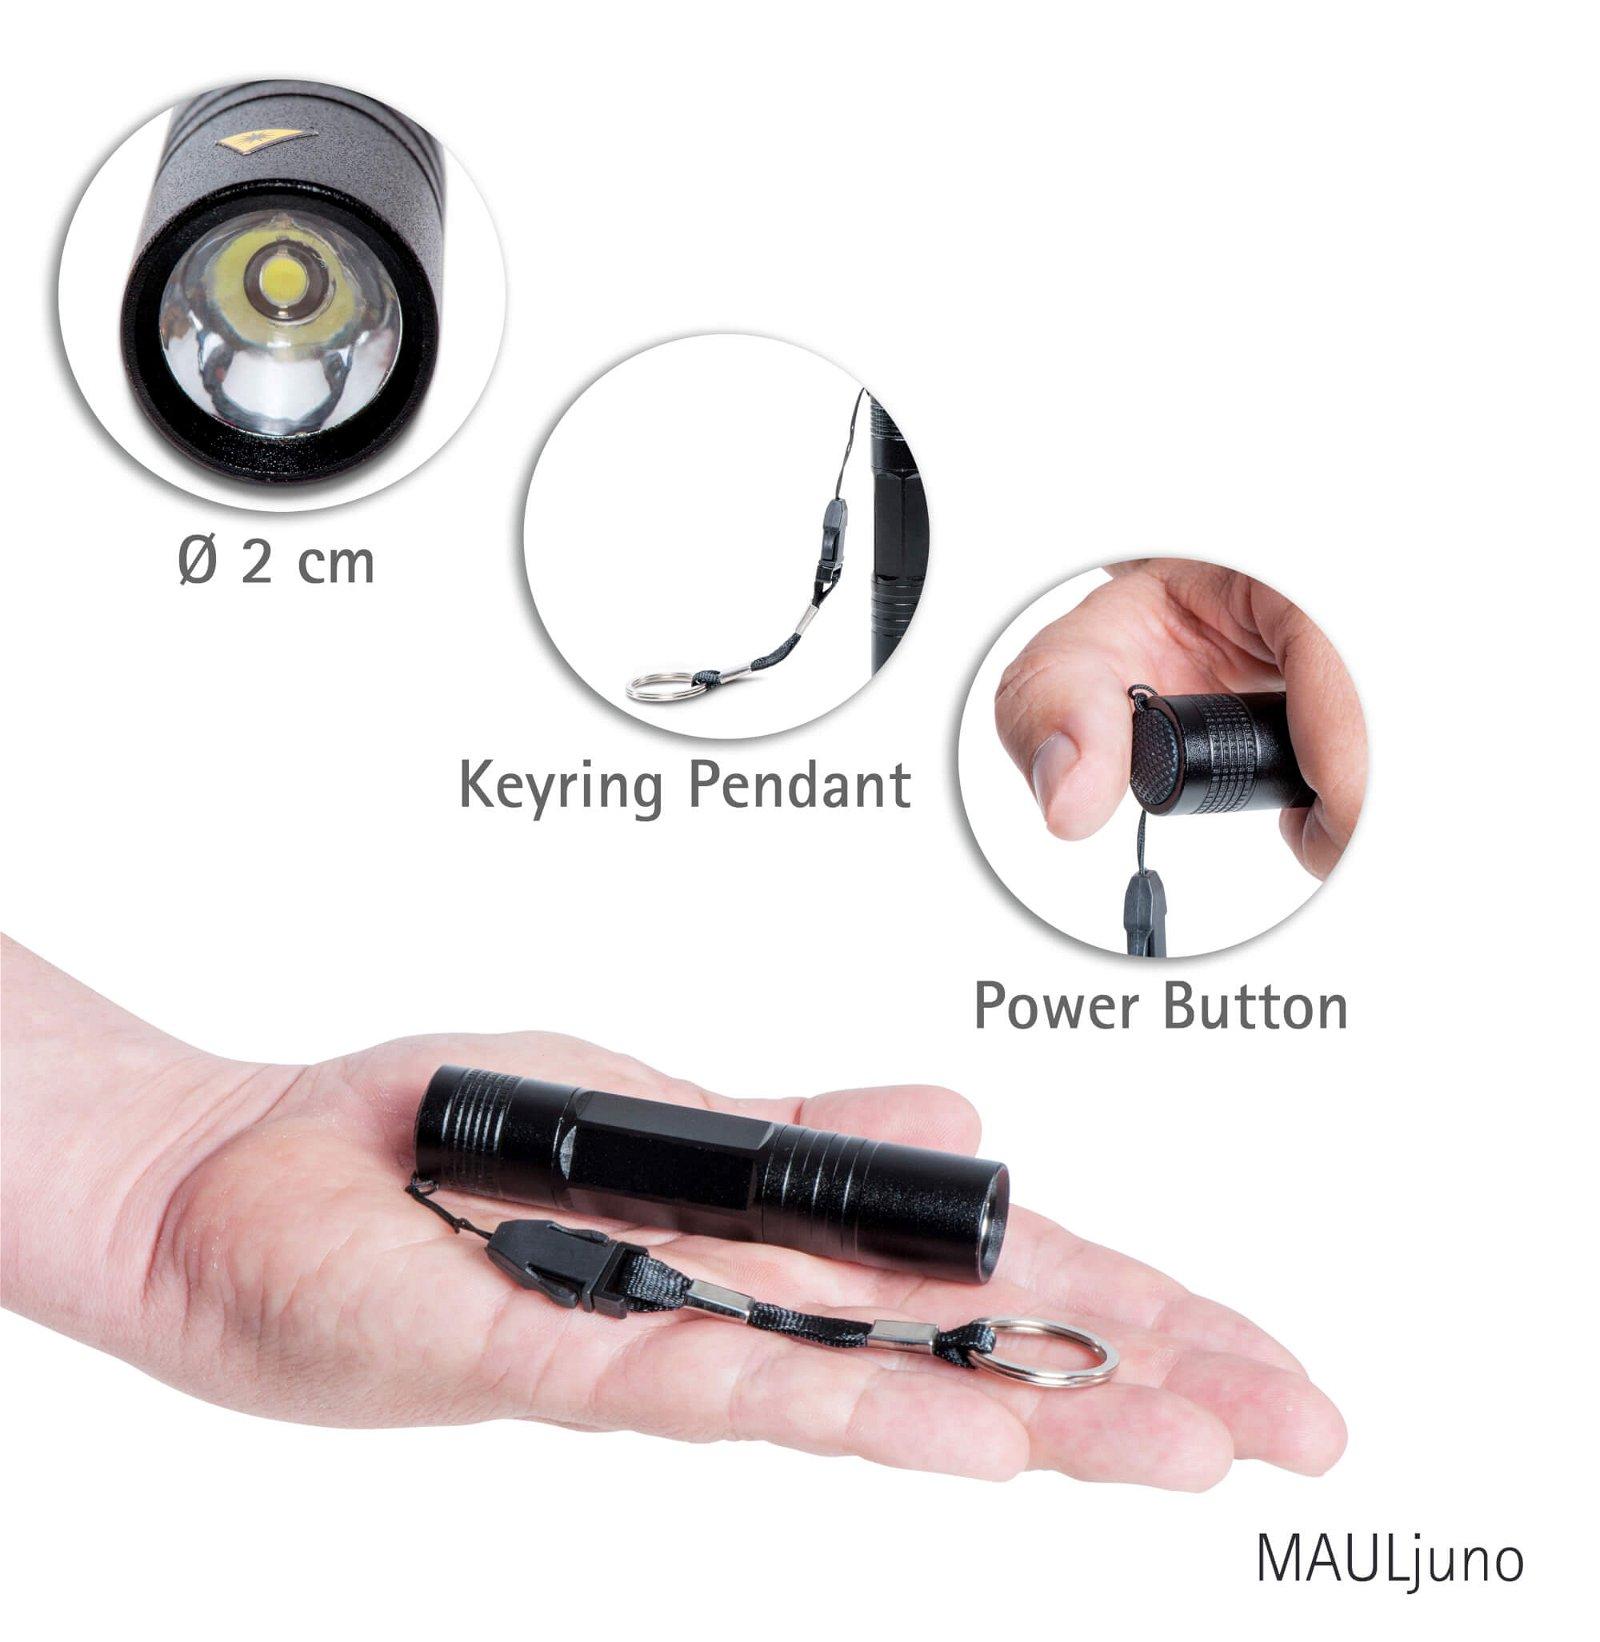 LED-Taschenlampe MAULjuno